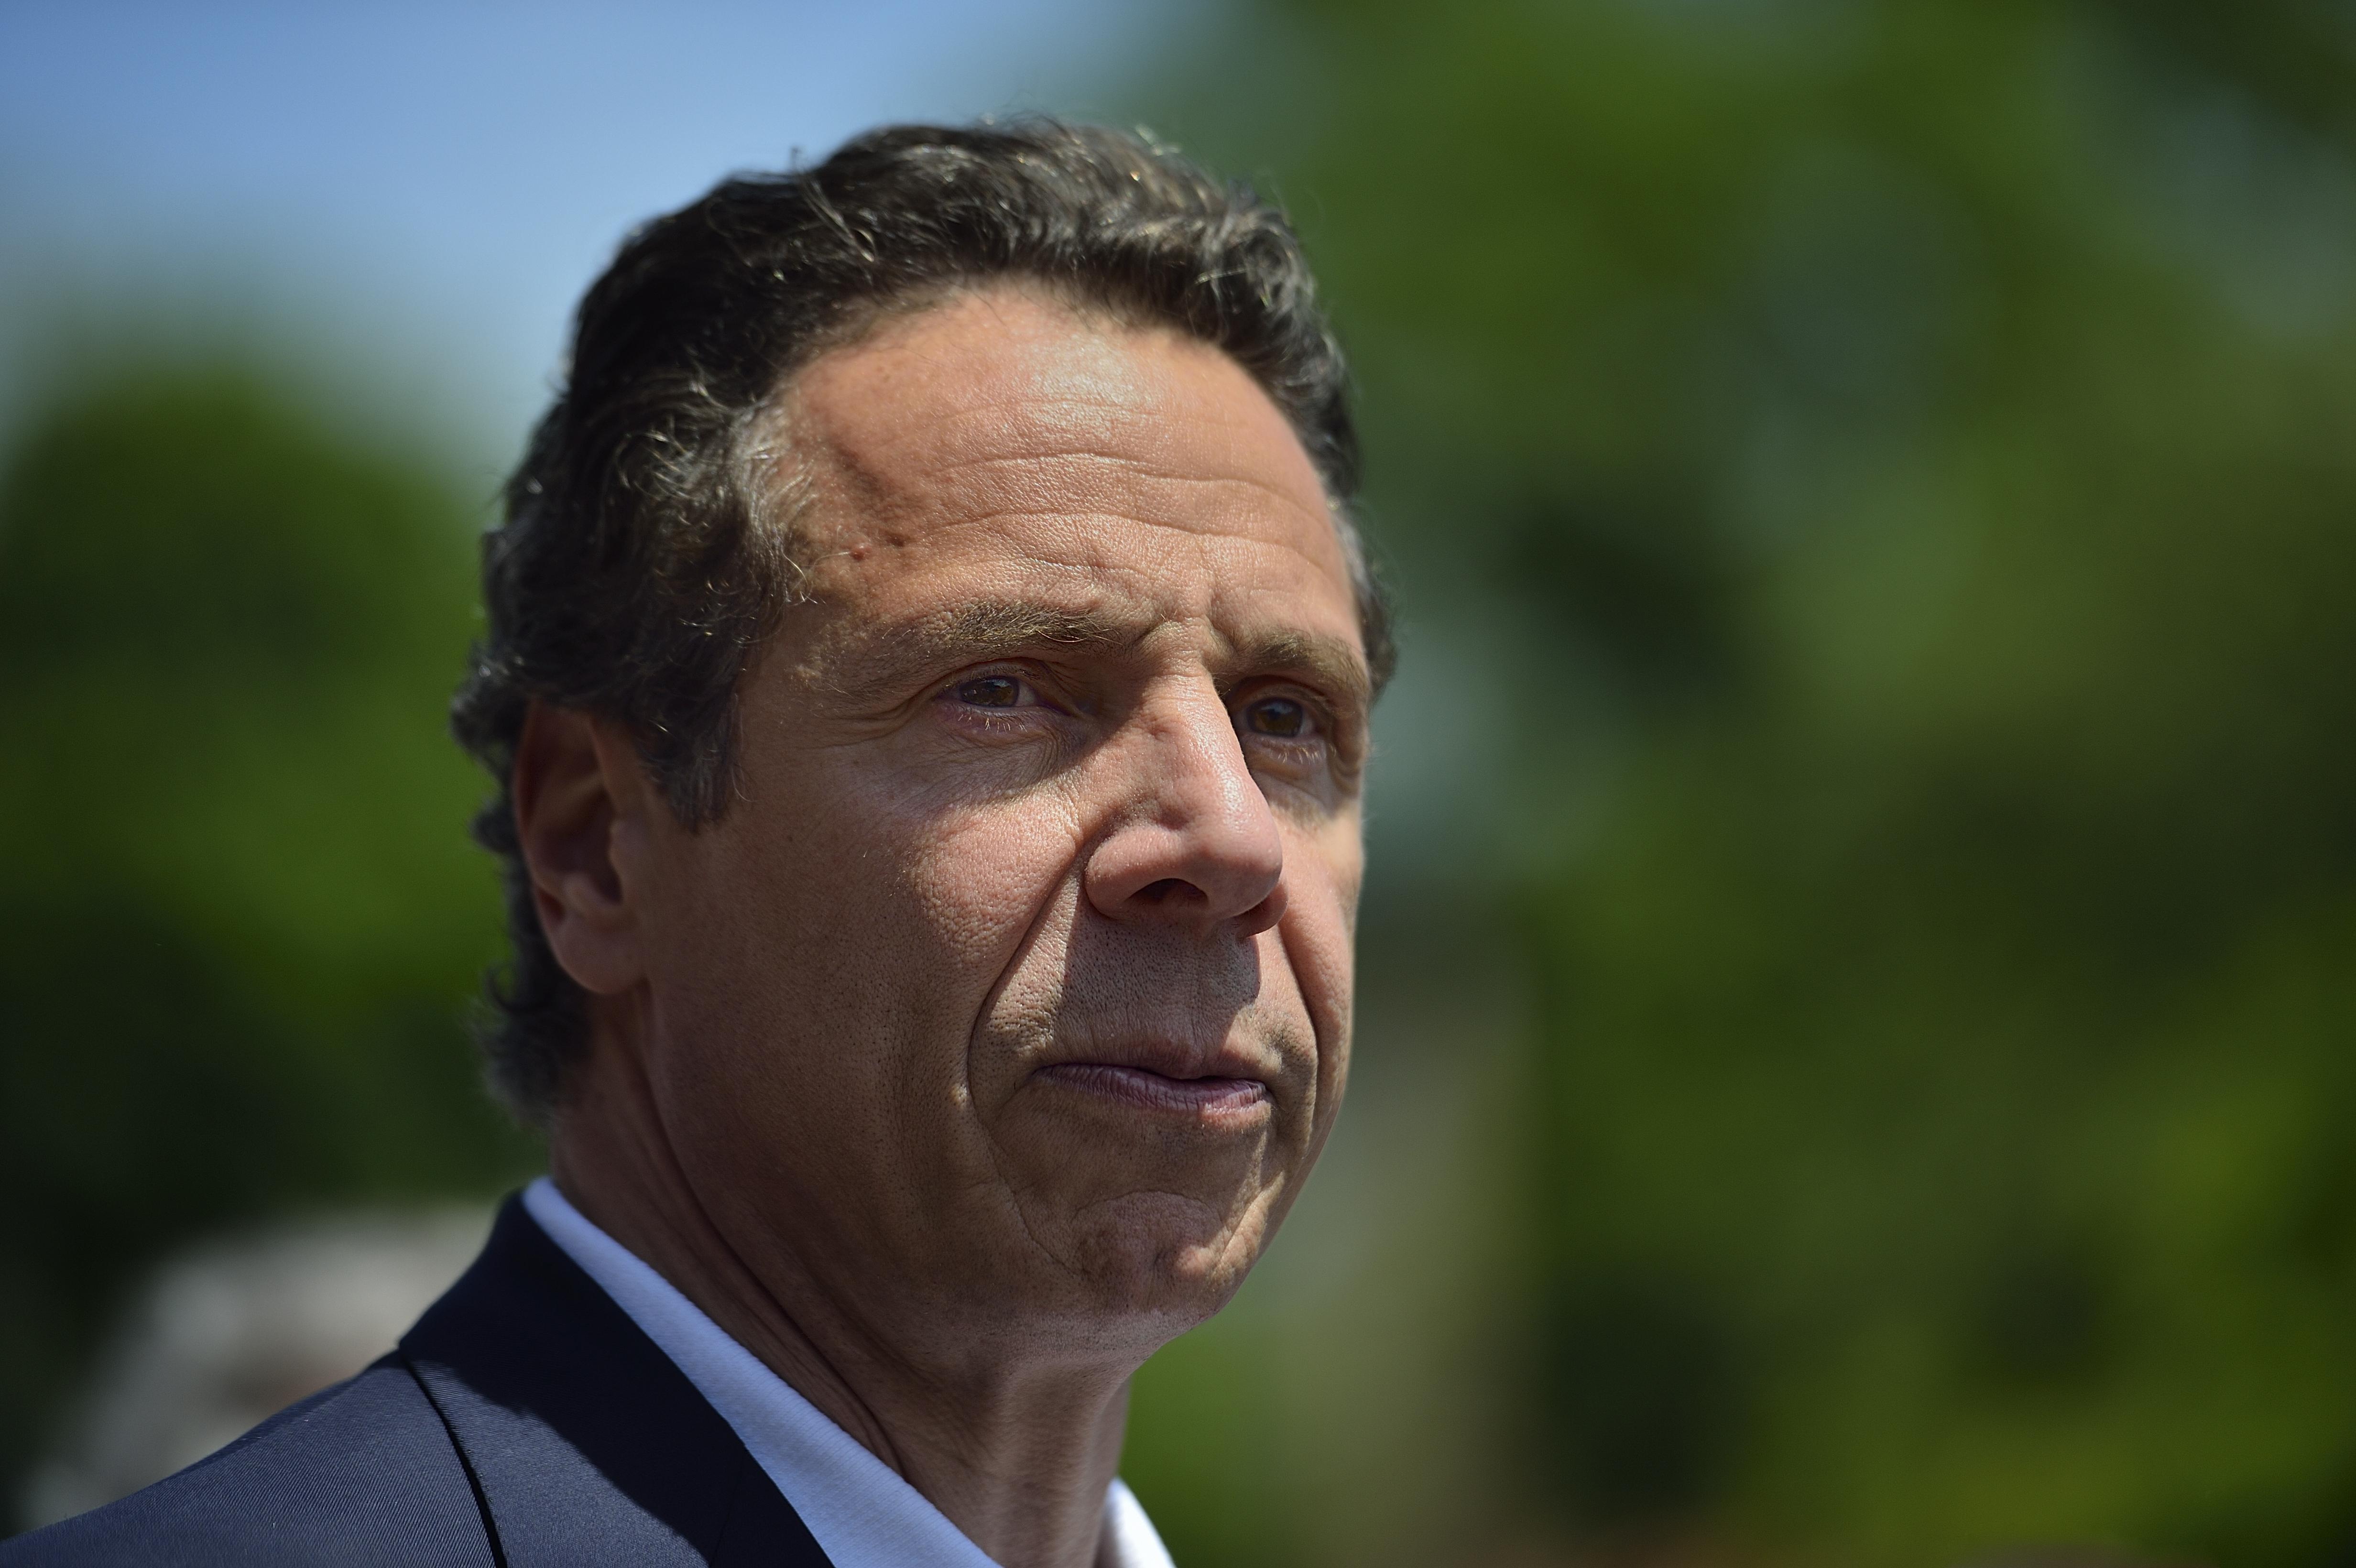 NY Gov. Cuomo Makes Big Move, Proposing $300m For Environmental Protection Fund